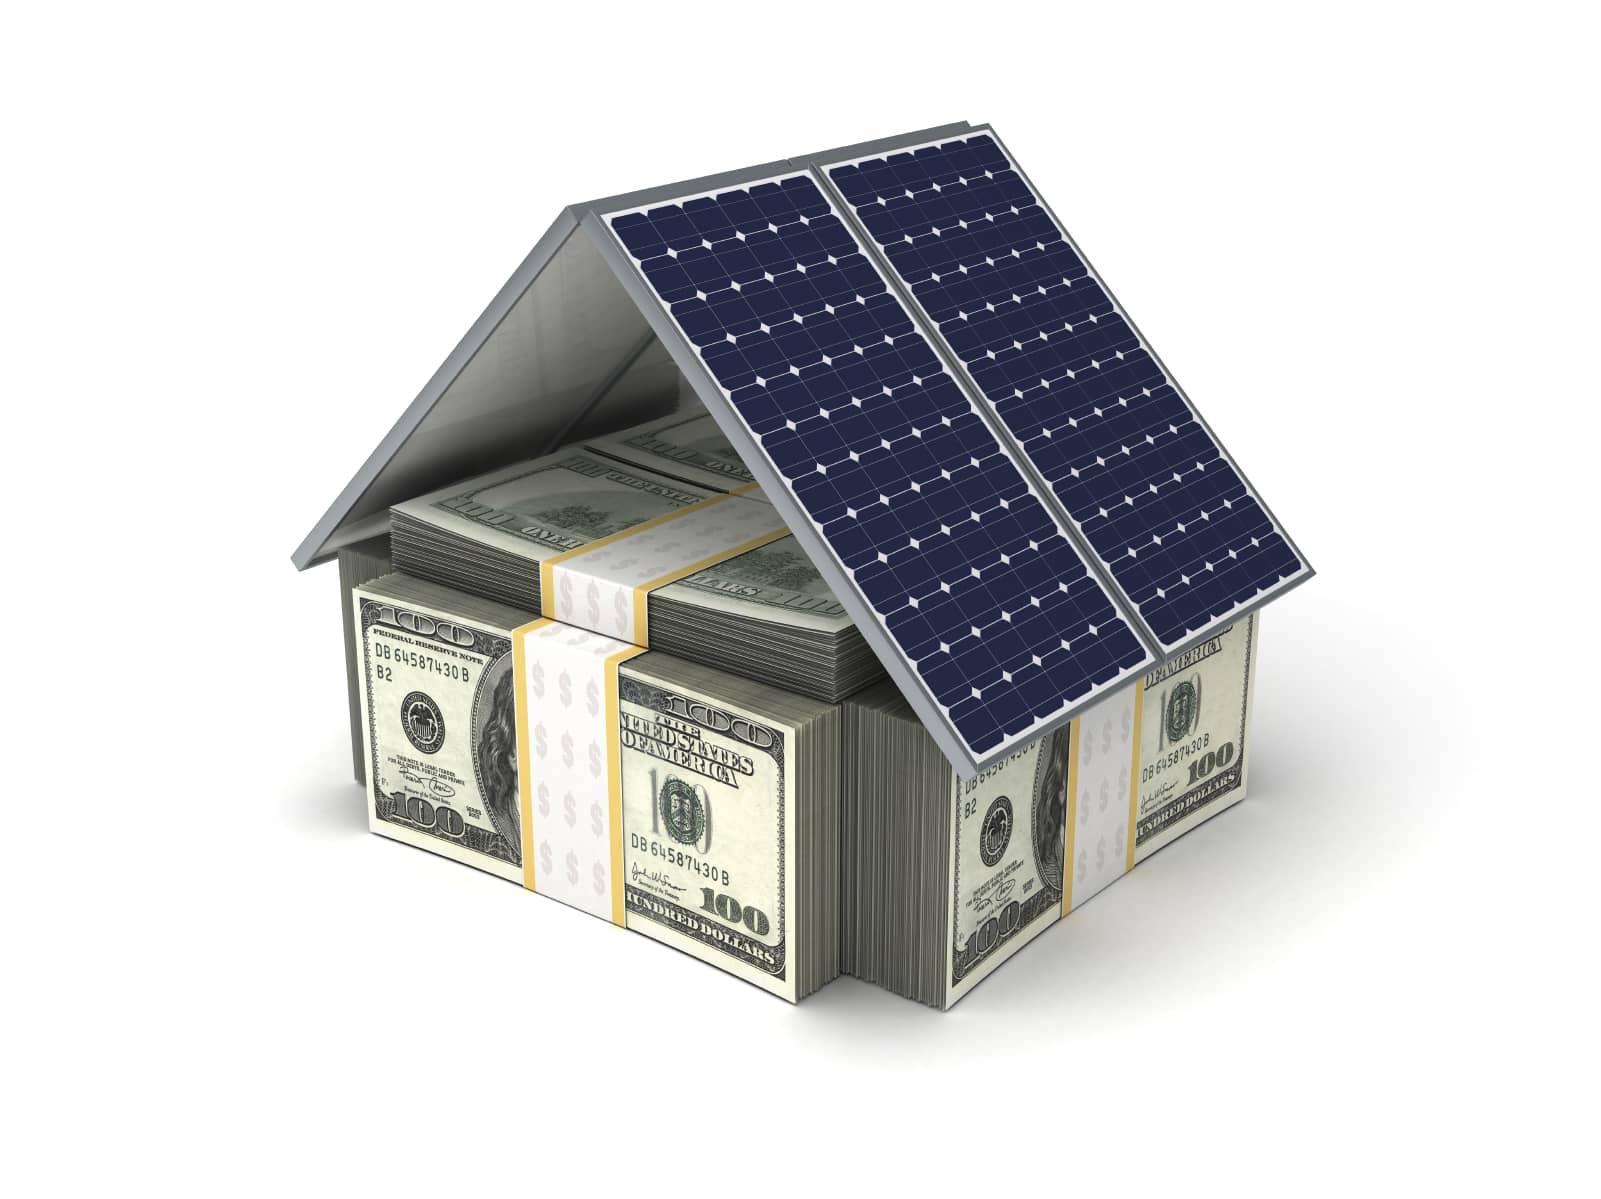 iStock_000028692636_Medium2 Illinois Utility ComEd Proposes Solar Rebate Program